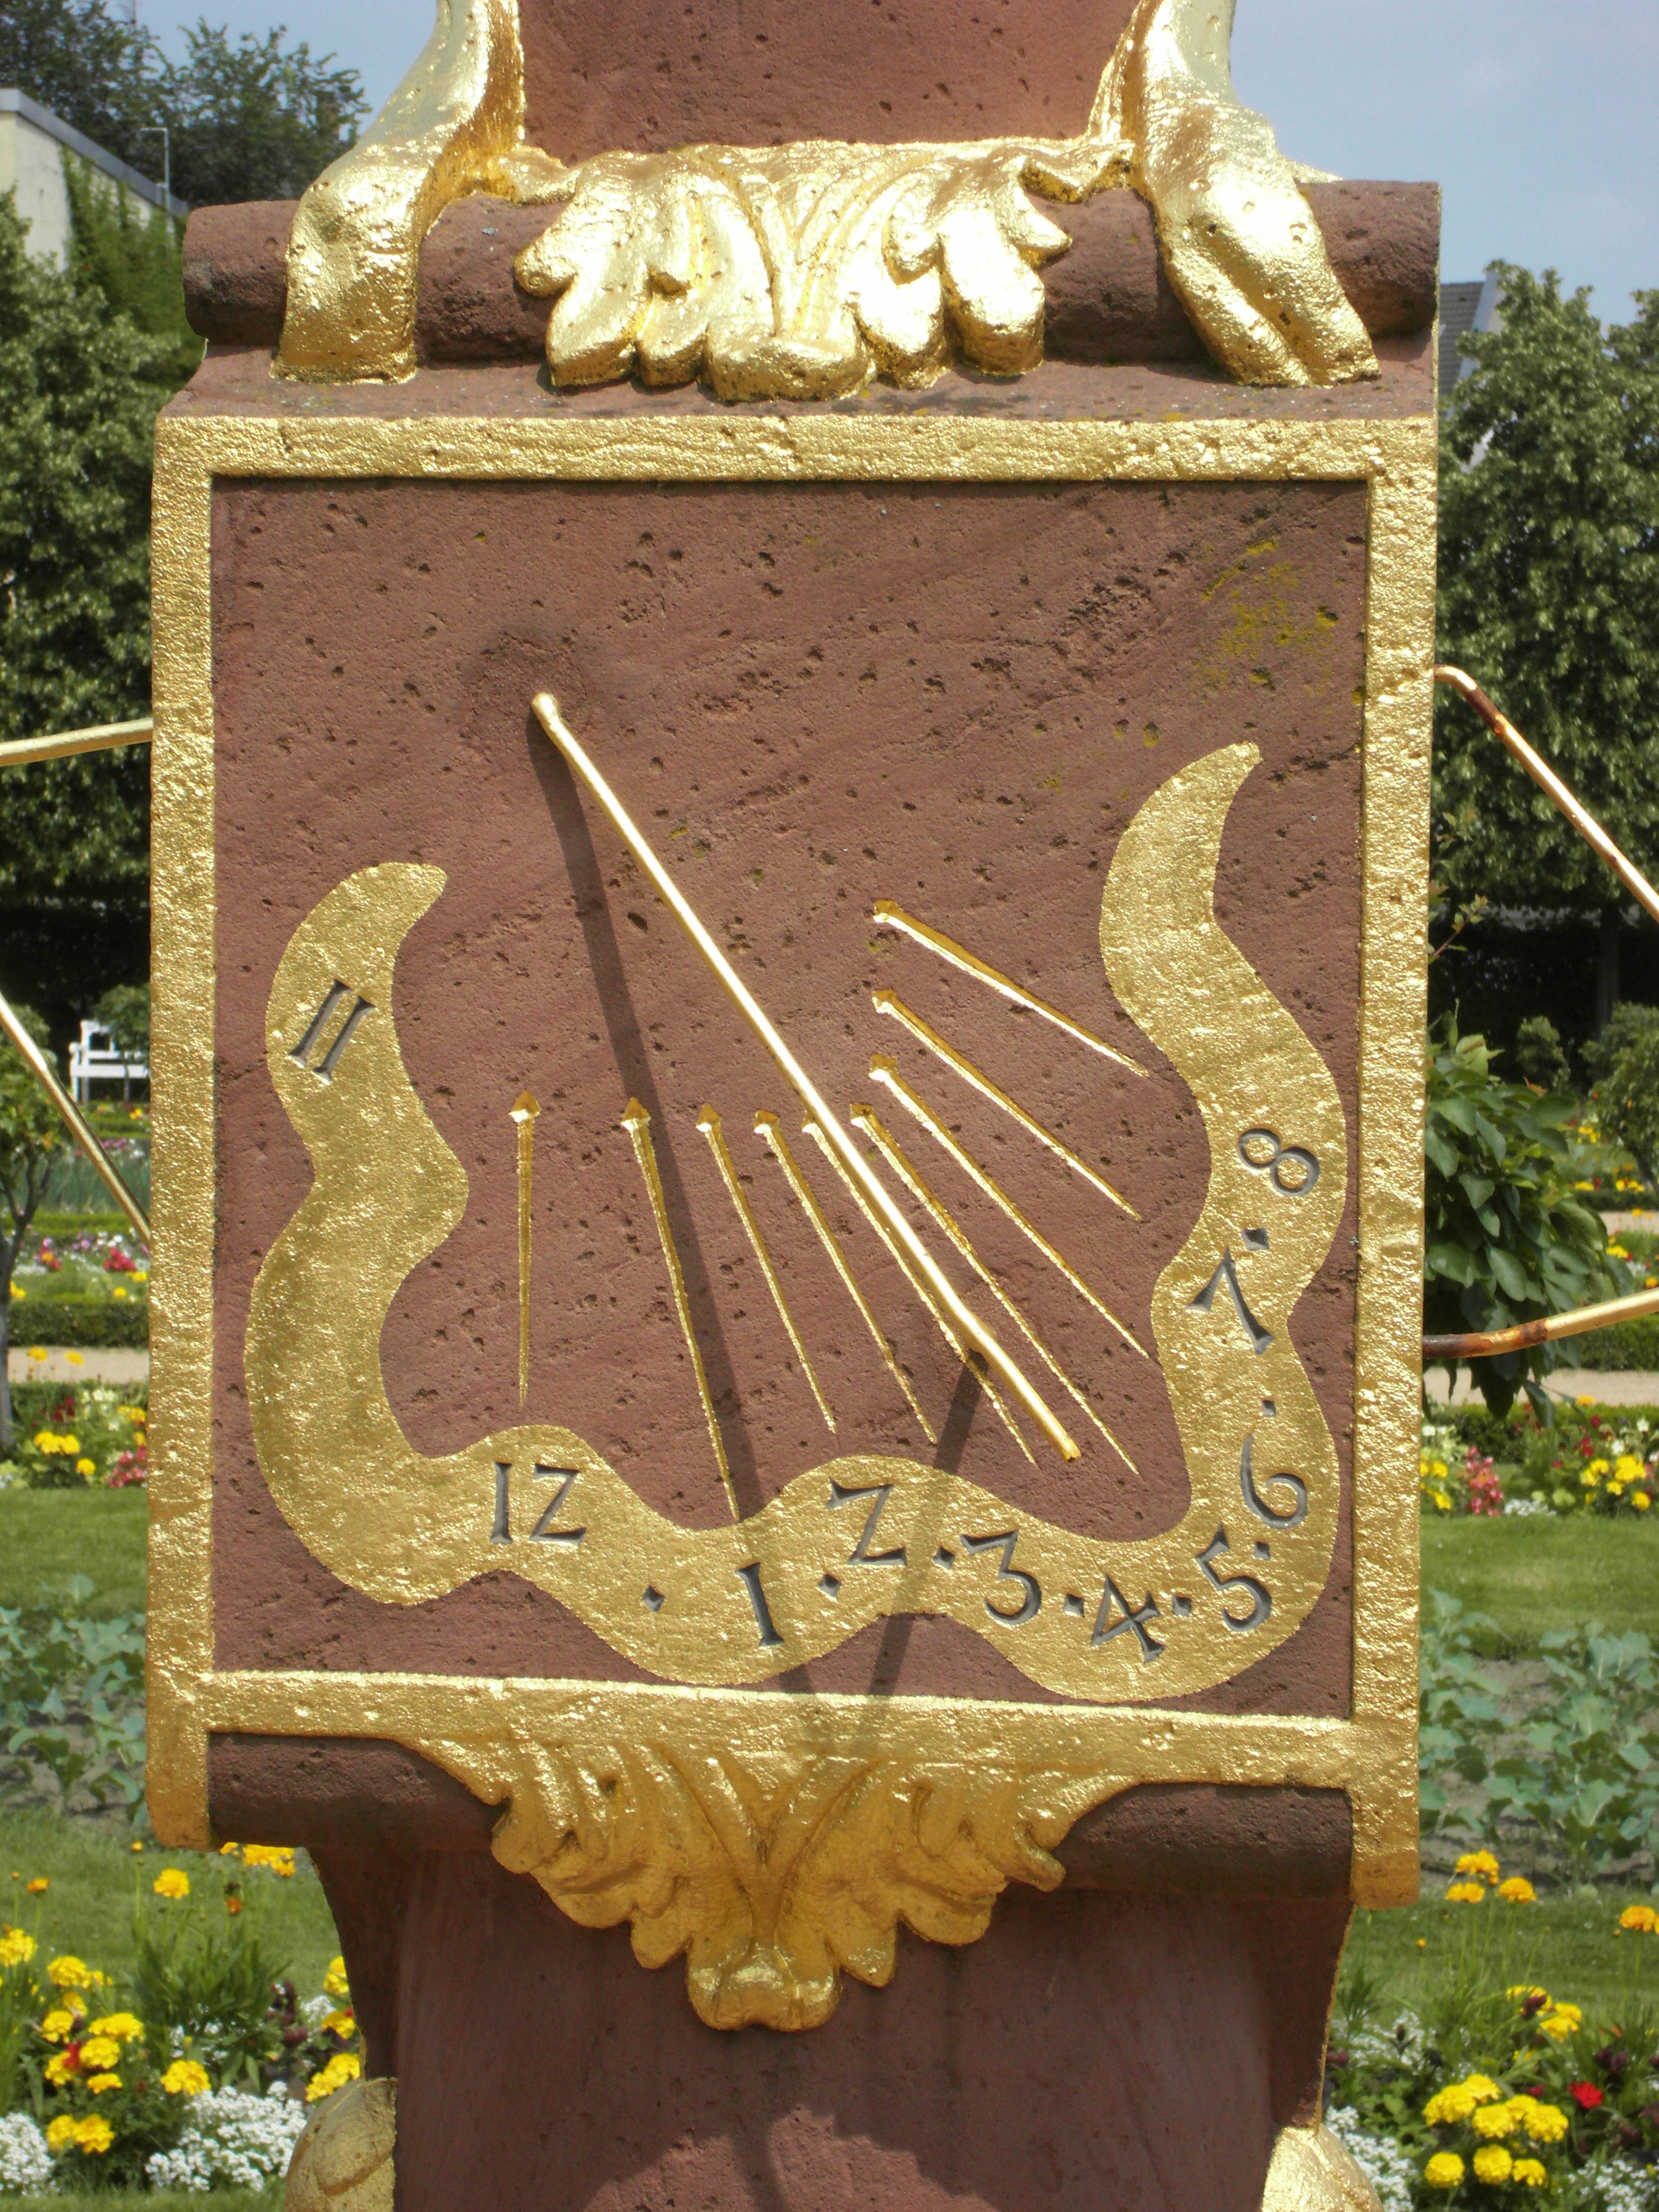 Filesonnenuhr Prinz Georg Garten Detail2 Darmstadtjpg Wikimedia